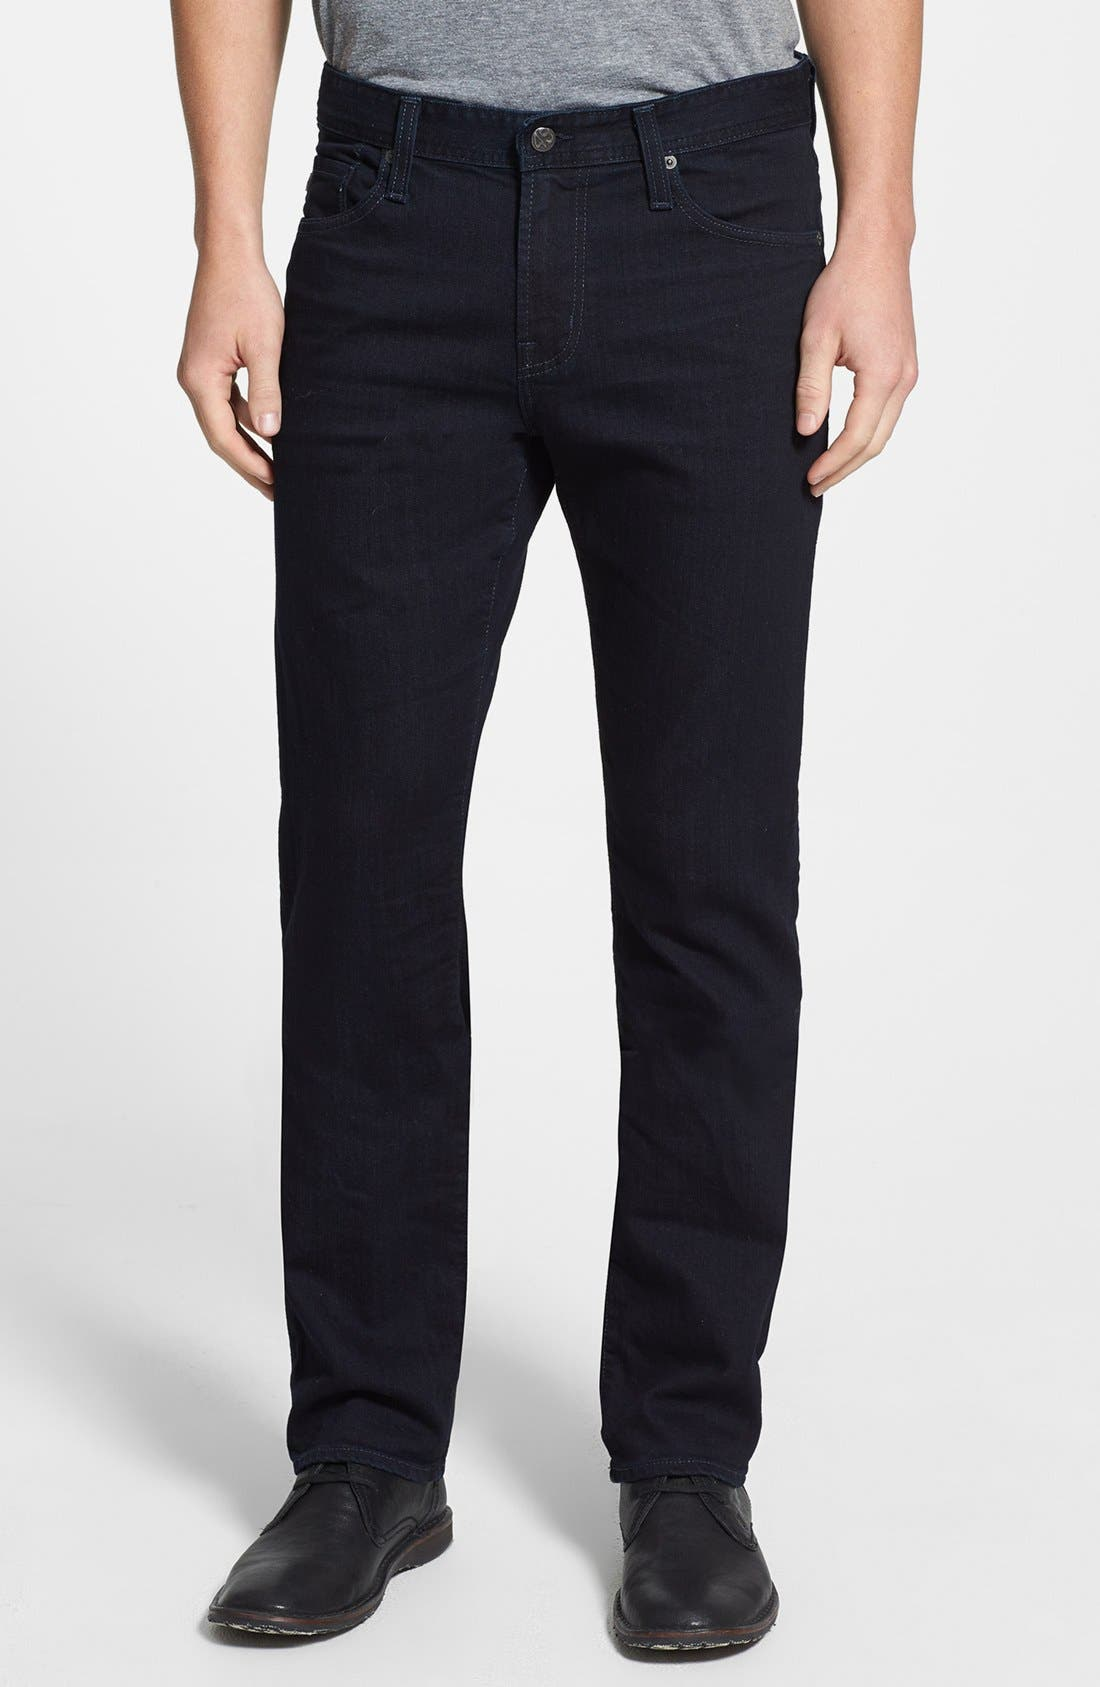 'Graduate' Tailored Fit Straight Leg Jeans, Main, color, 409